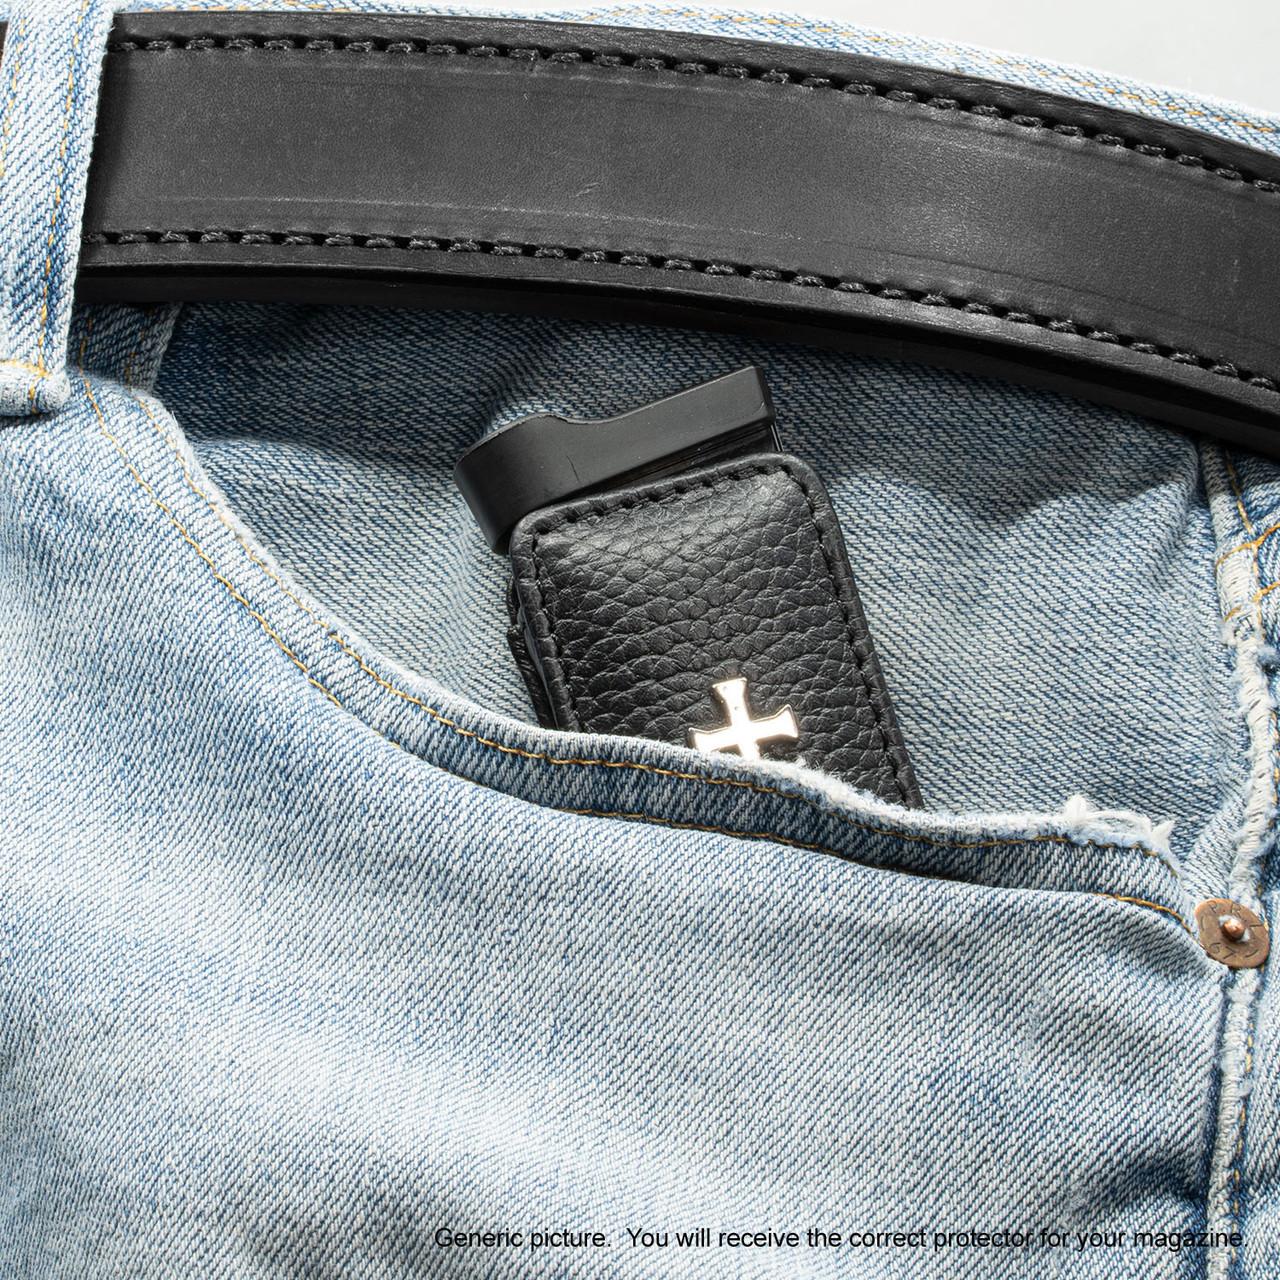 AMT Backup .380 Black Leather Cross Magazine Pocket Protector